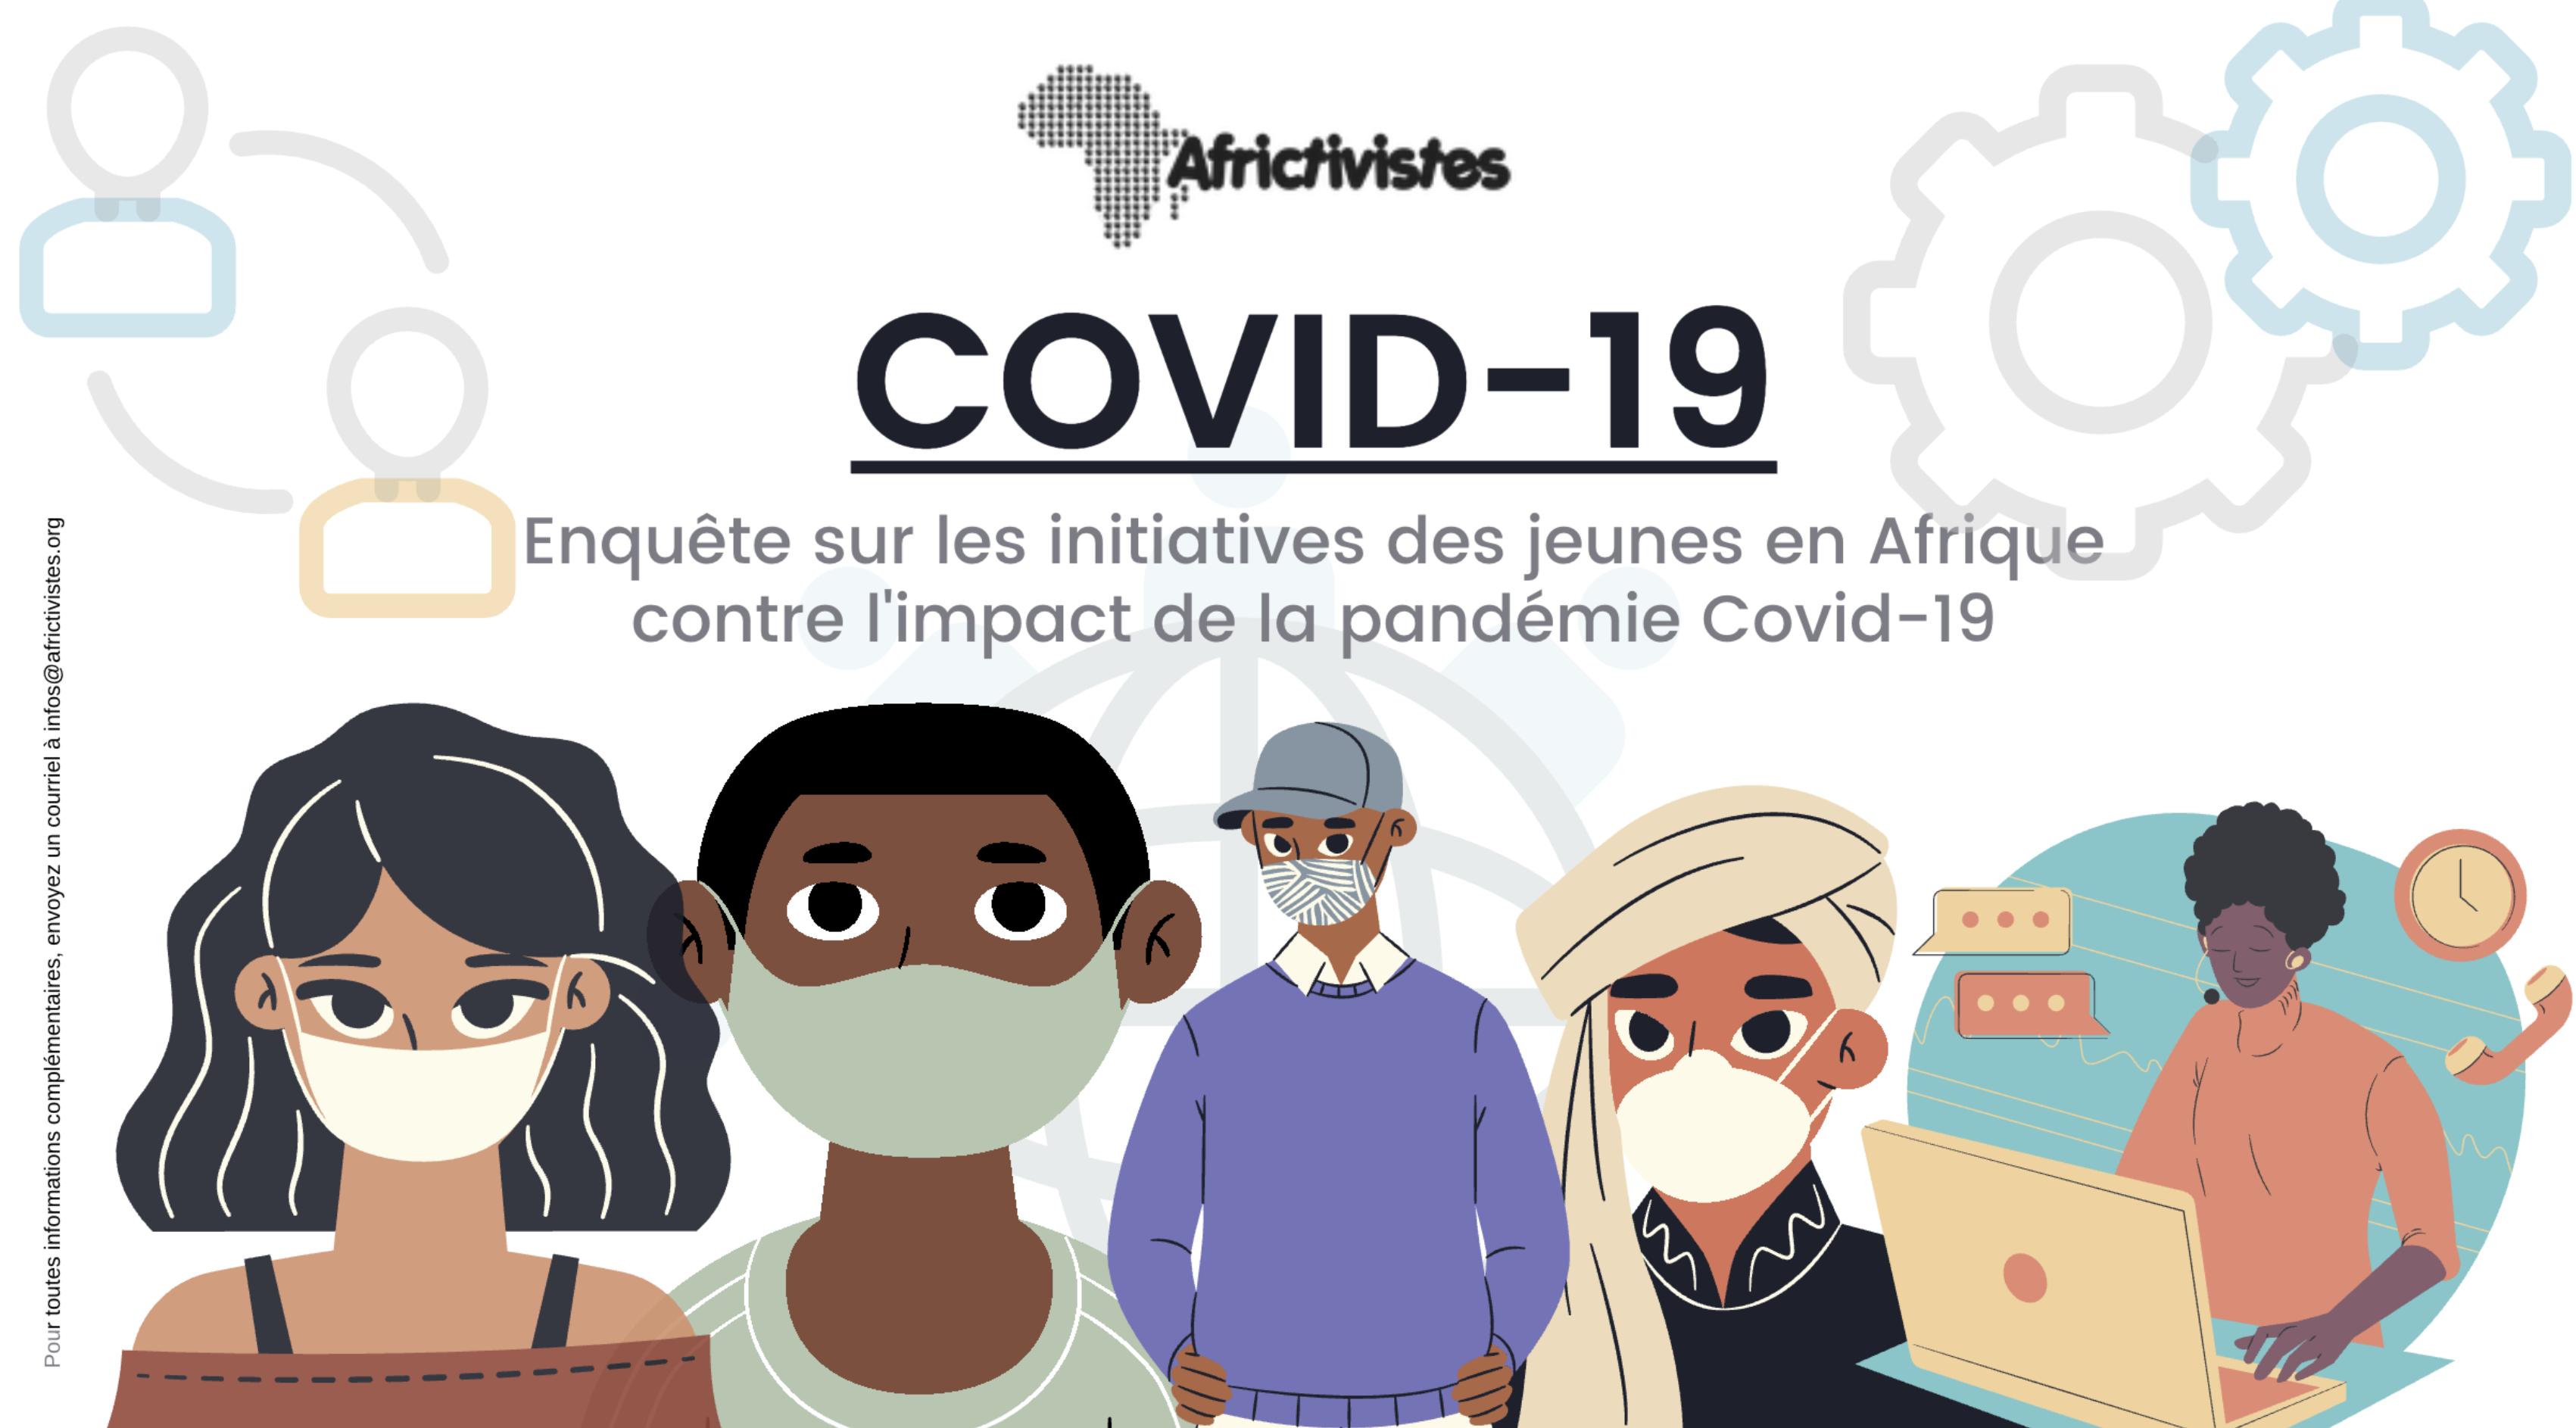 Cartographie d'initiatives de jeunes contre l'impact de la COVID-19